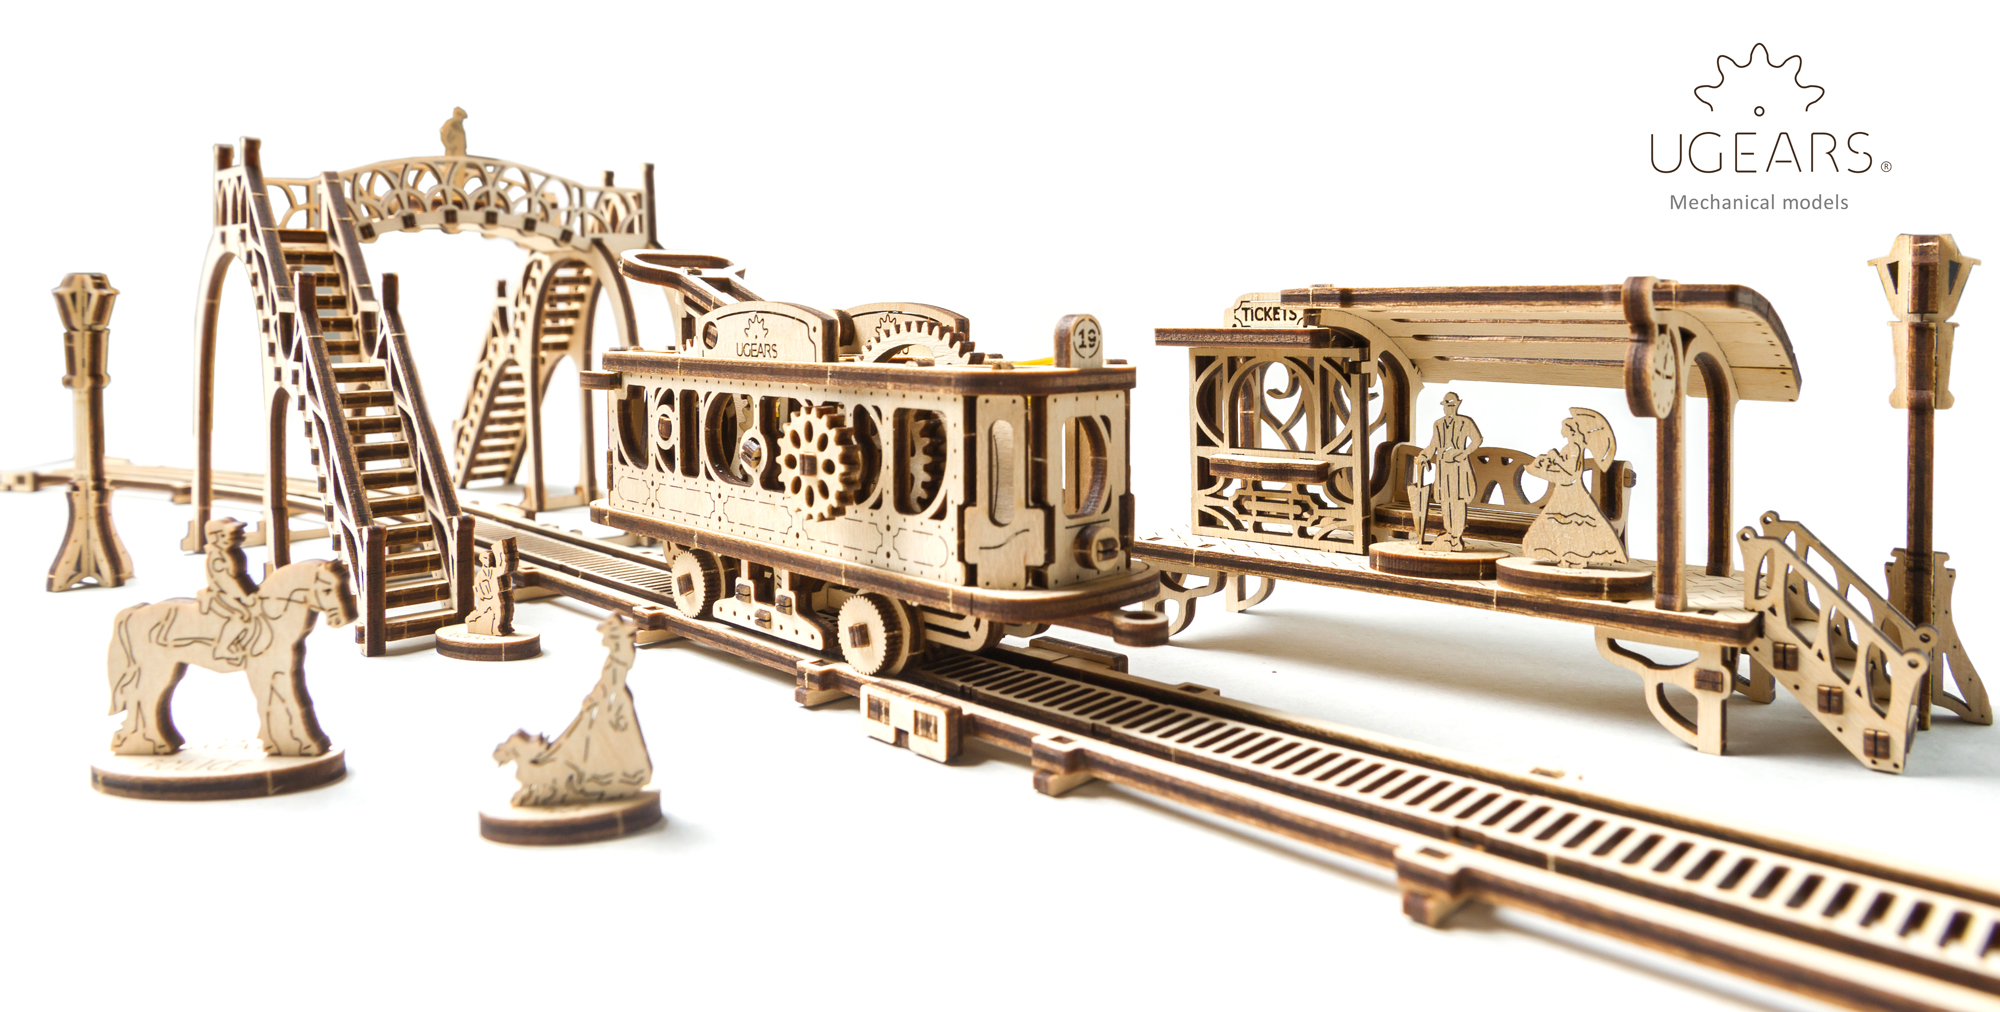 Tram Line Model叮叮車車站(Ugears 機械小鎮Mechanical Town Series)